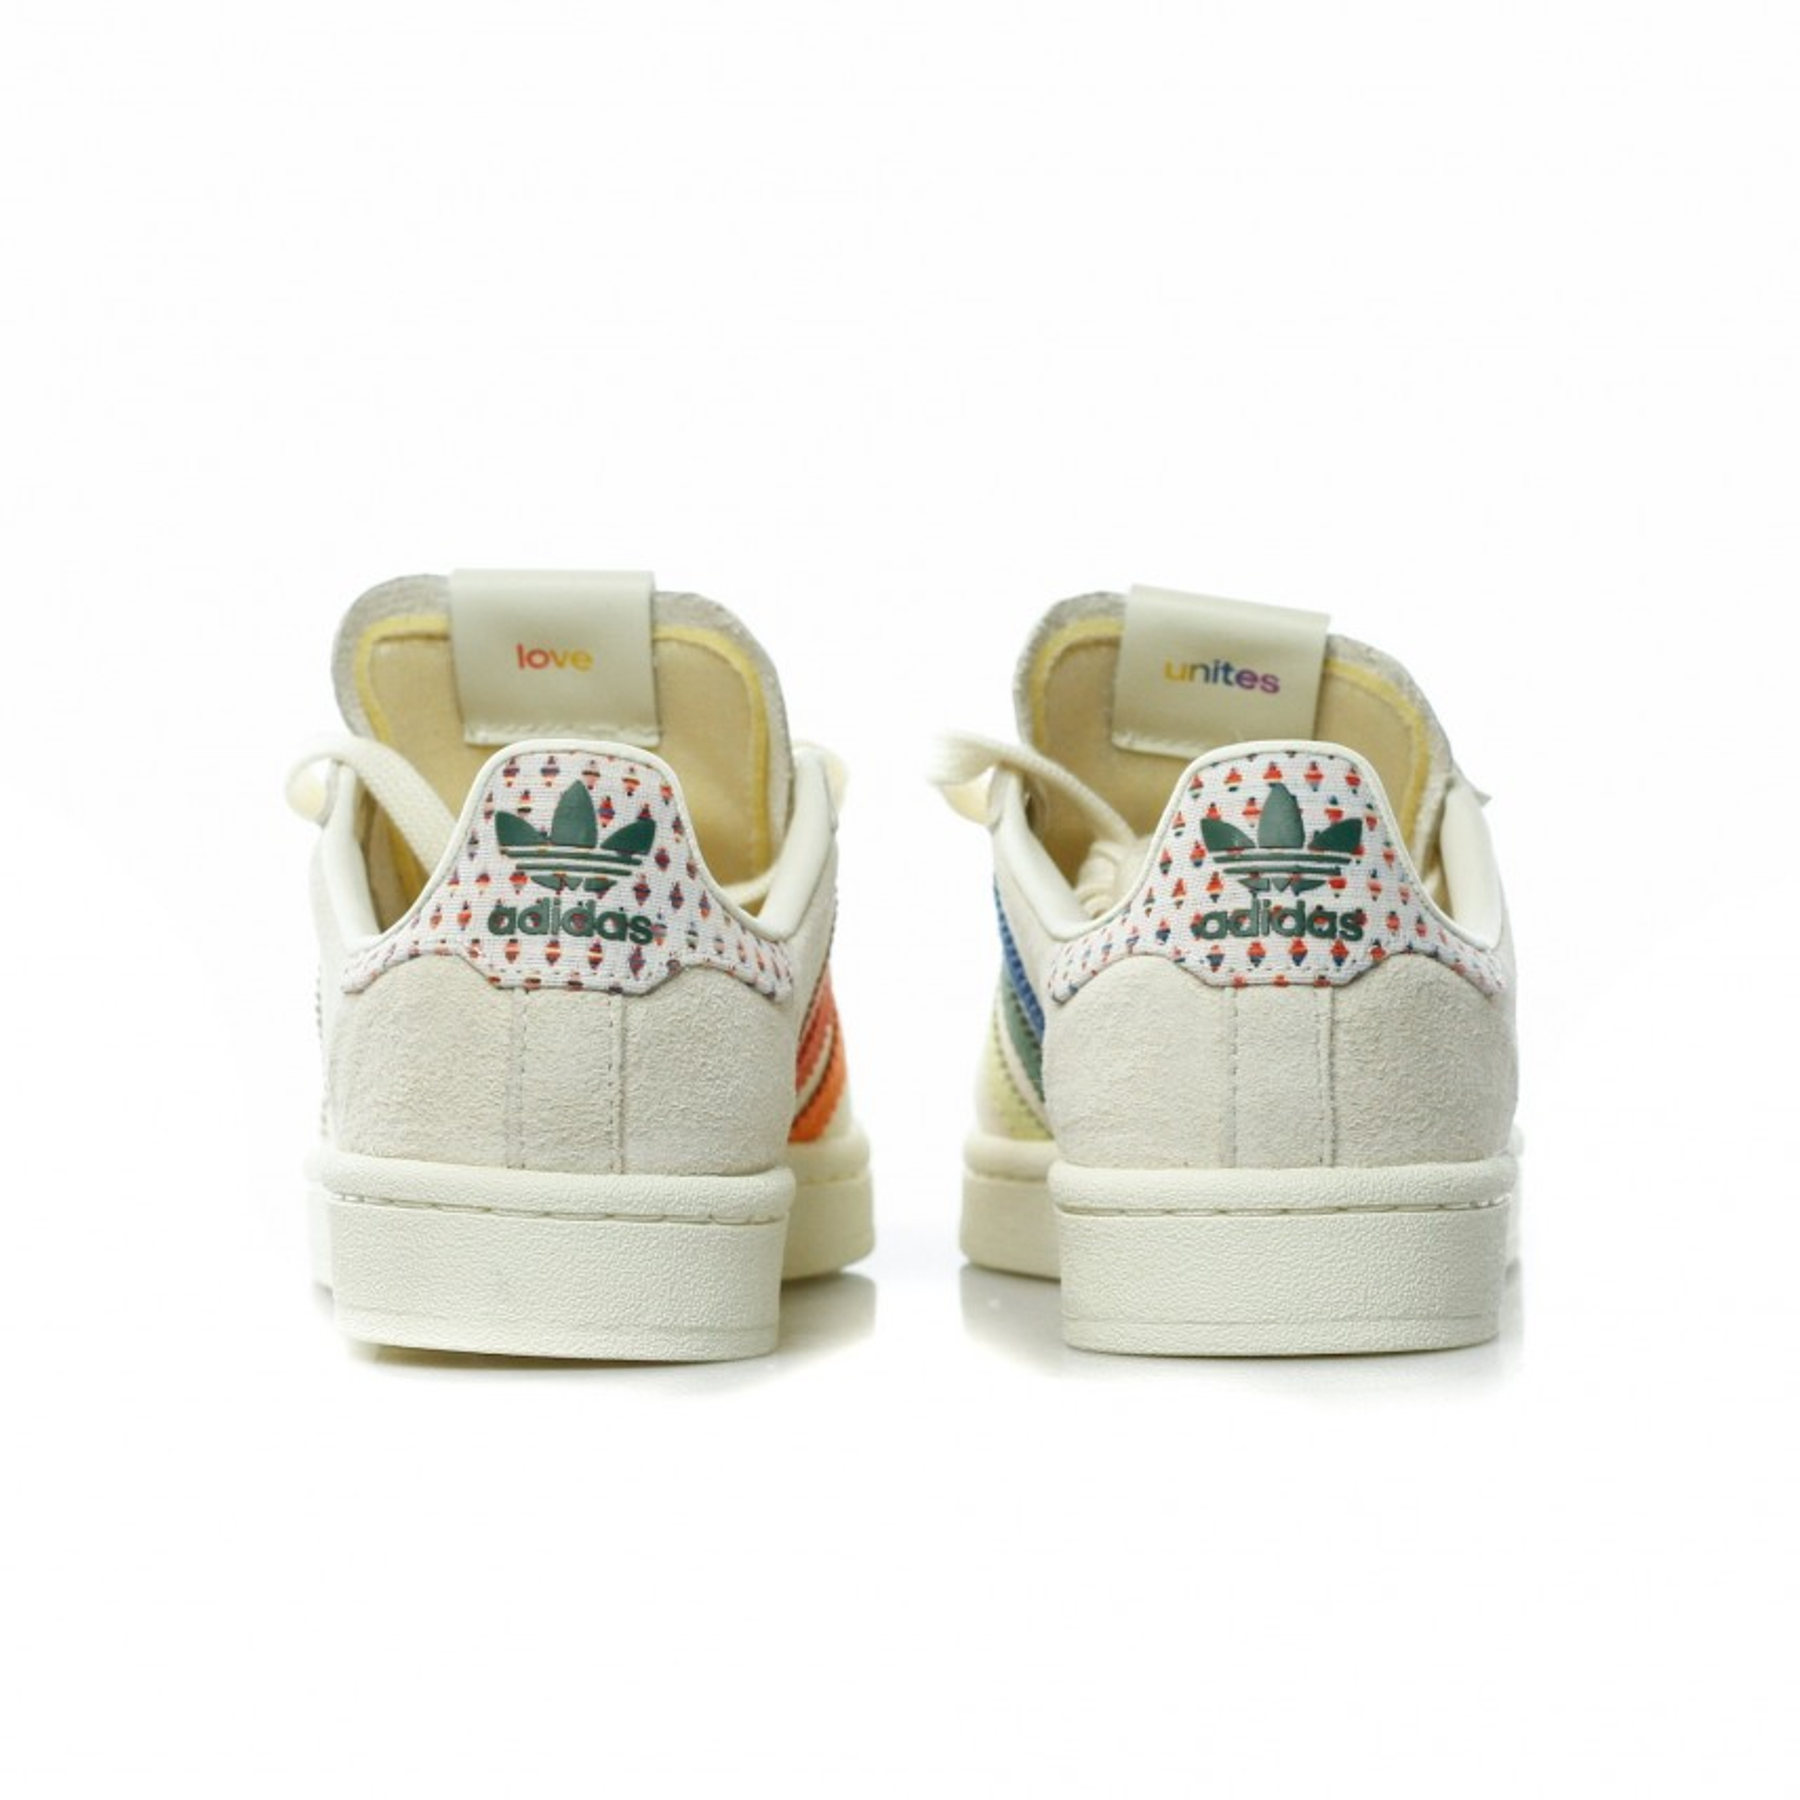 Campus Pride Shoes Cream White 12.5 Mens | Pride shoes